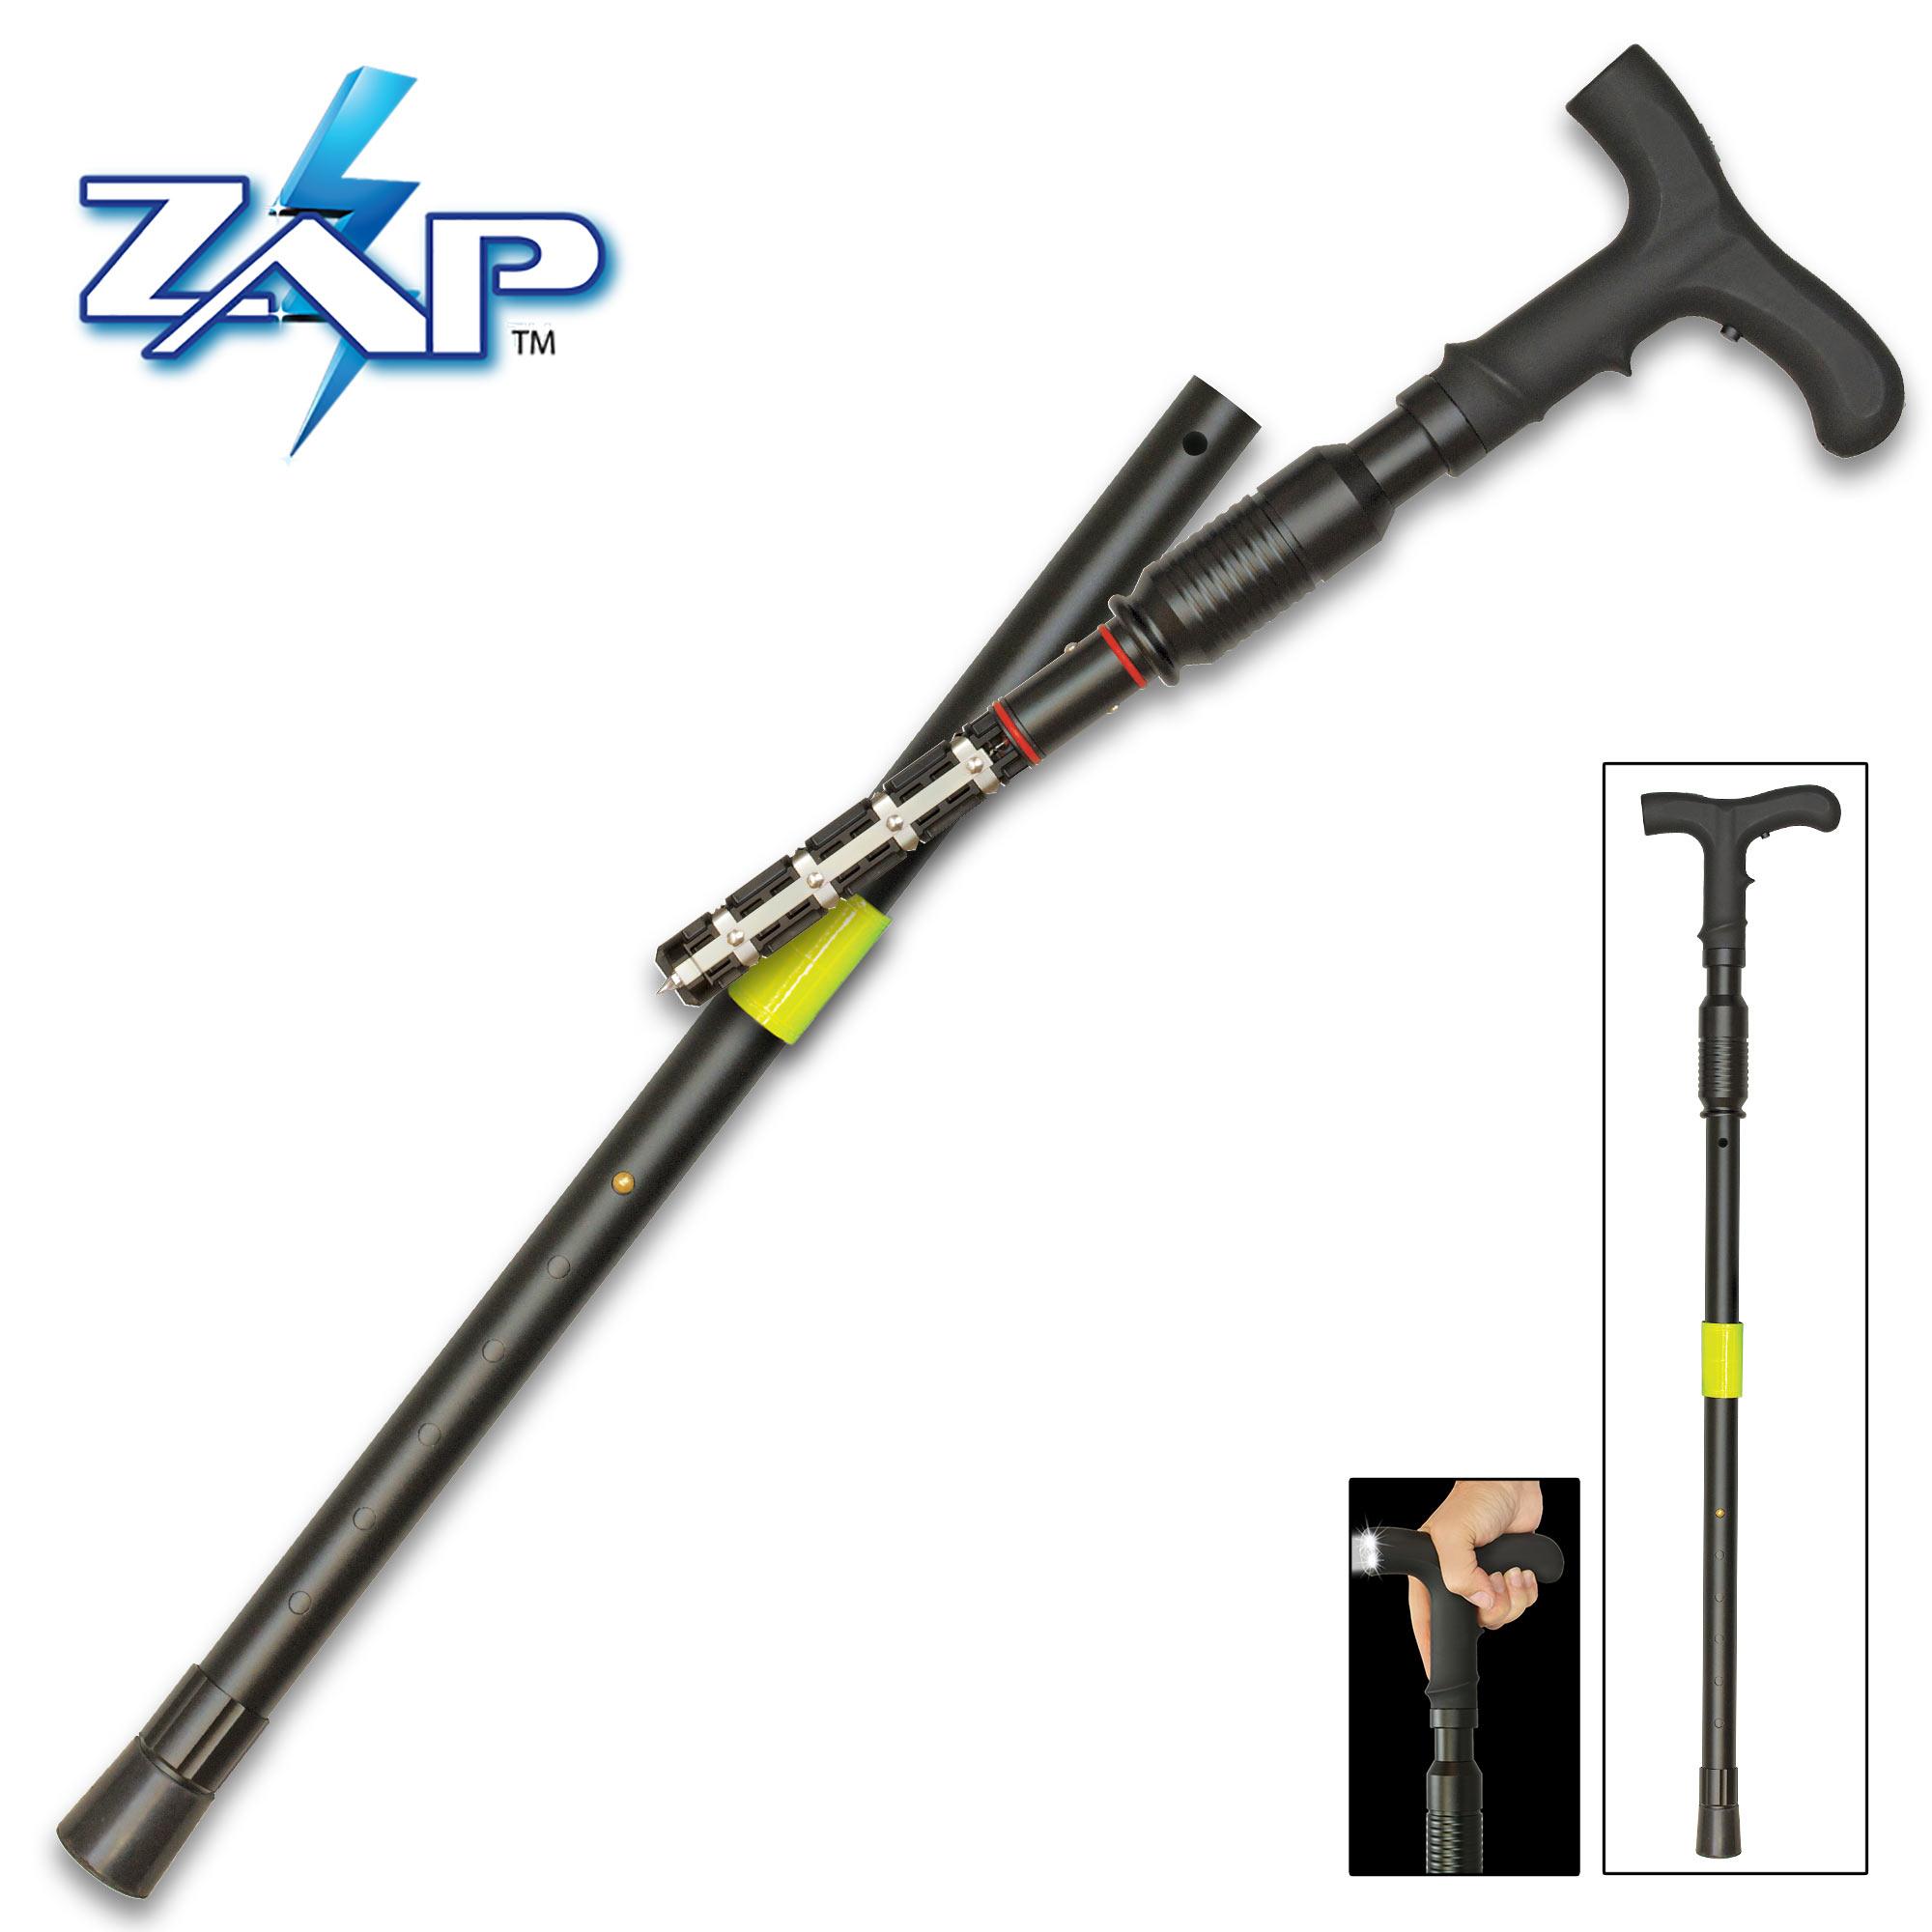 Zap Covert Cane With Flashlight And Stun Gun Led Light